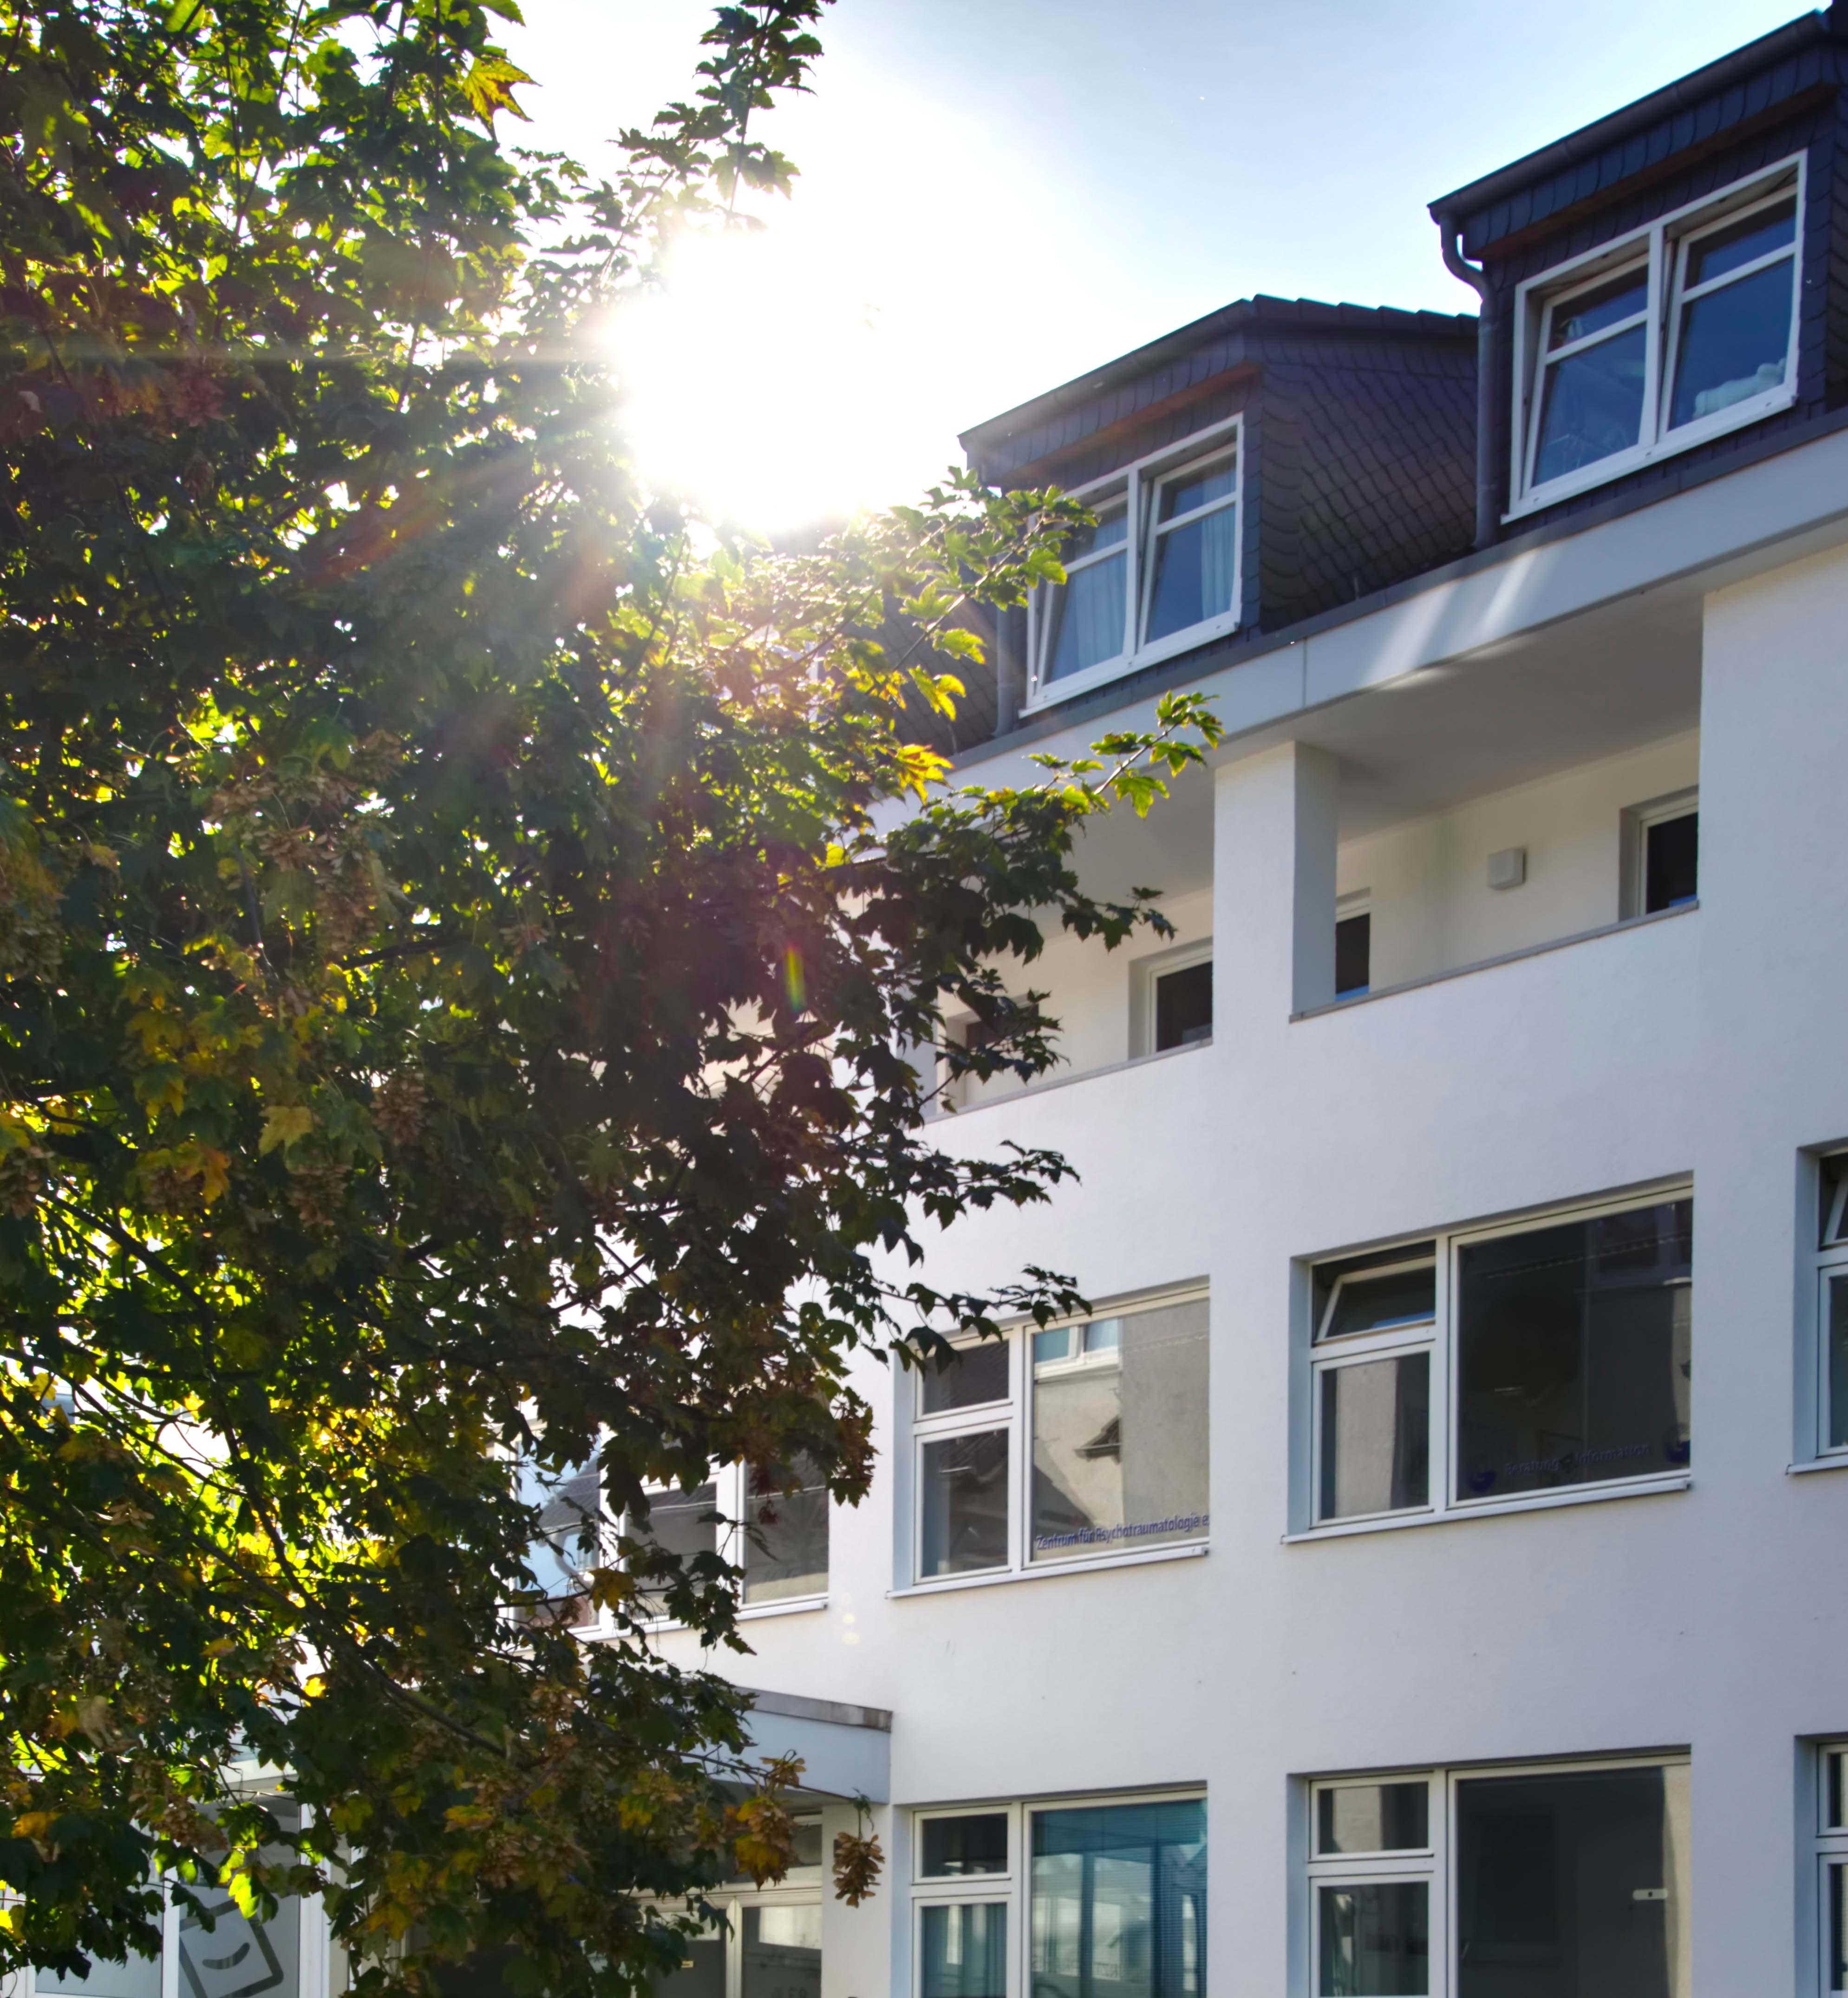 Zentrum für Psychotraumatologie e.V. Kassel